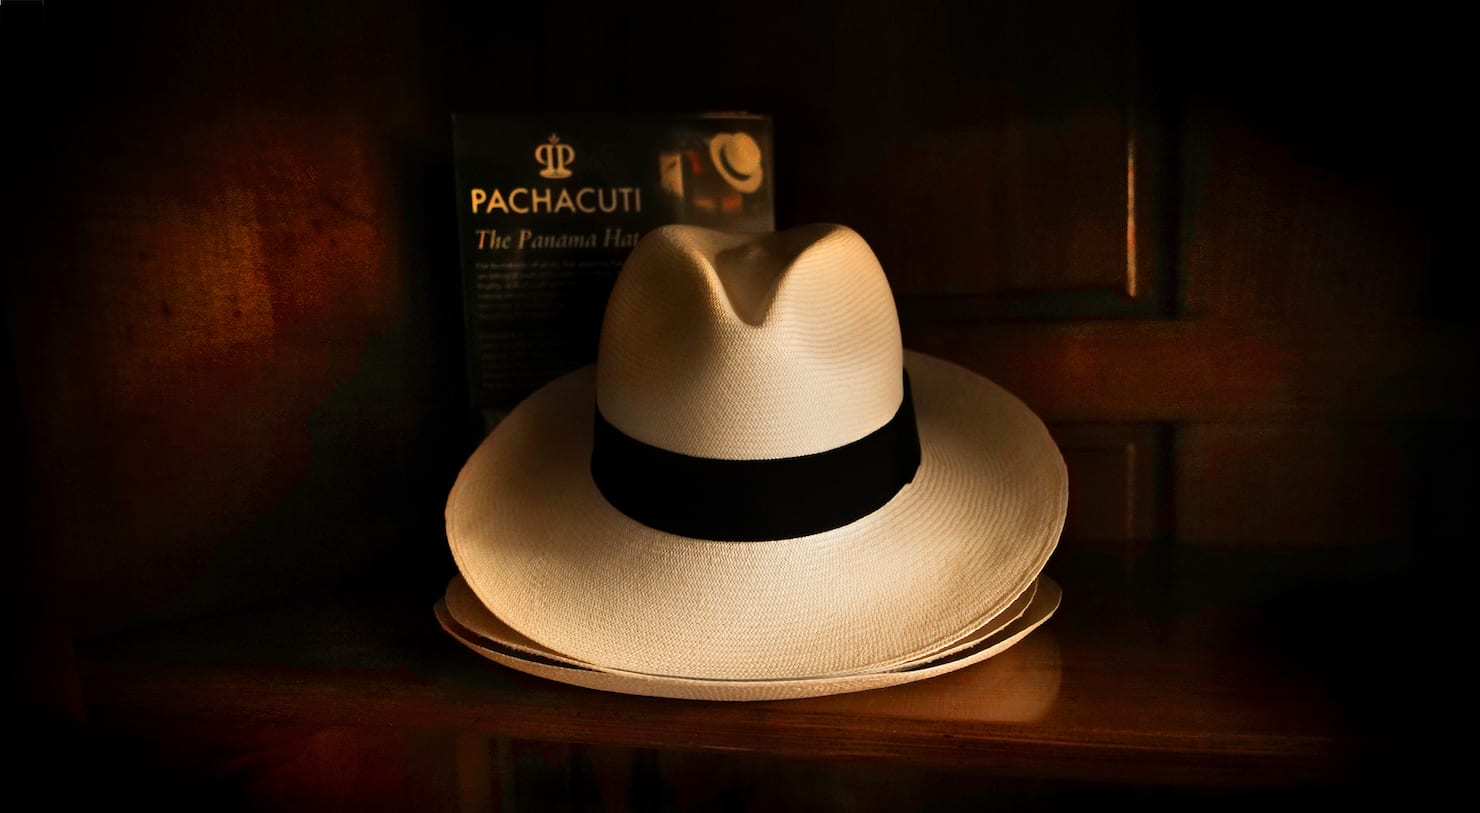 A Legendary Hat Pachacuti